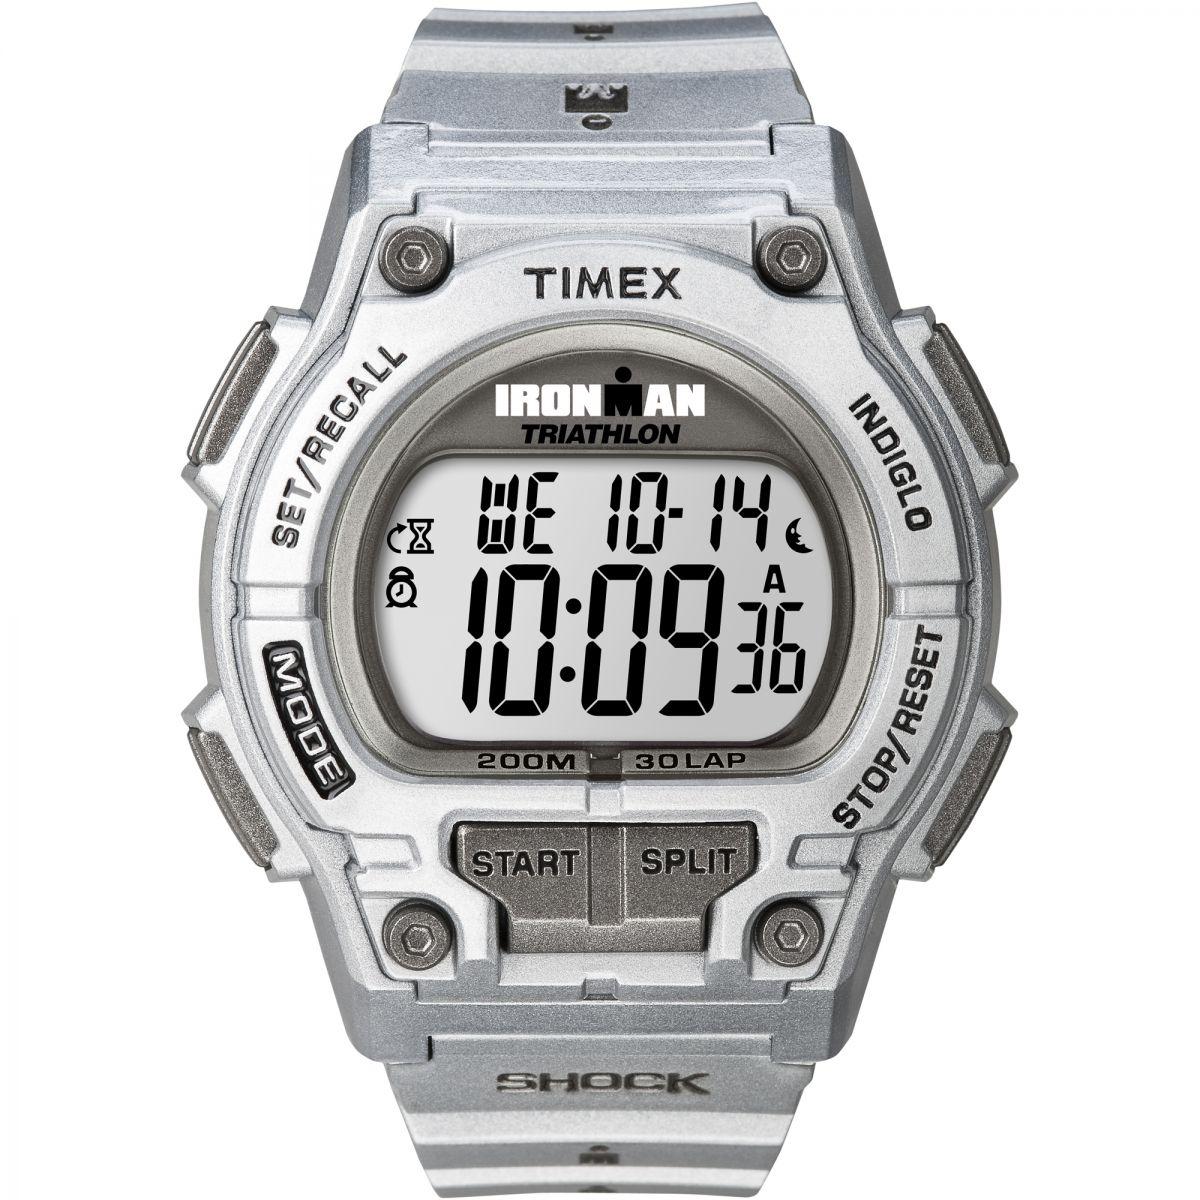 USER MANUAL - Timex